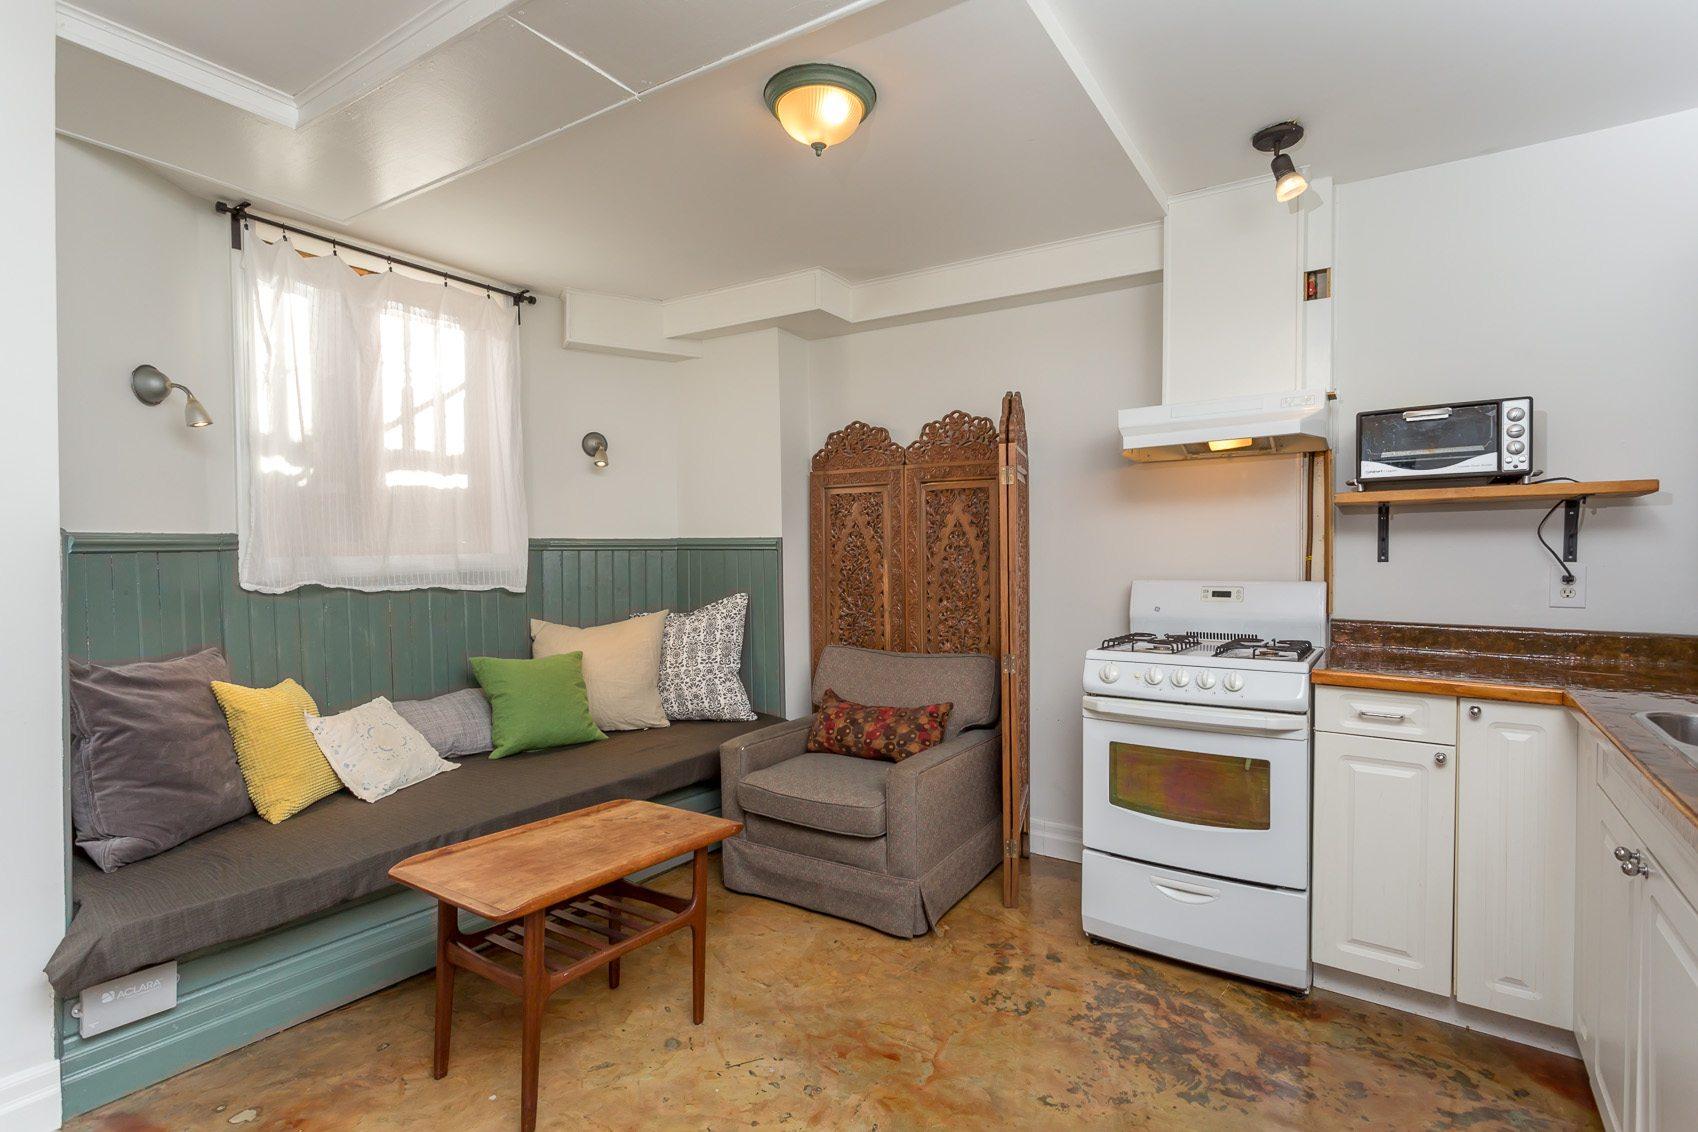 toronto-house-for-sale-44-nassau-street-14